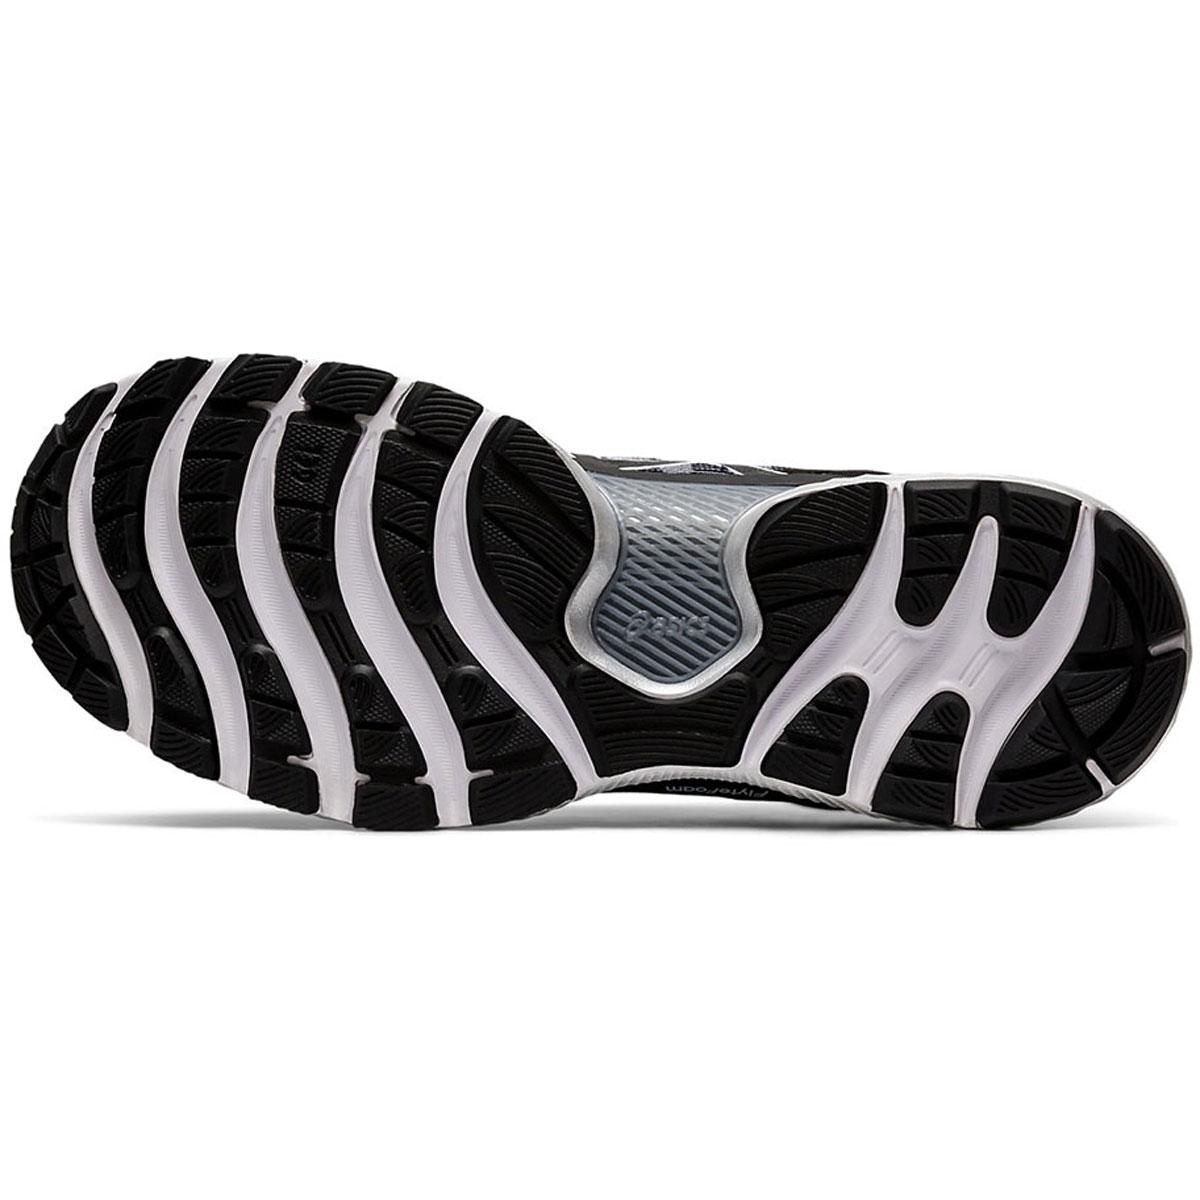 Men's Asics GEL-Nimbus 22 Running Shoe - Color: White/Black (Regular Width) - Size: 8.5, White/Black, large, image 3